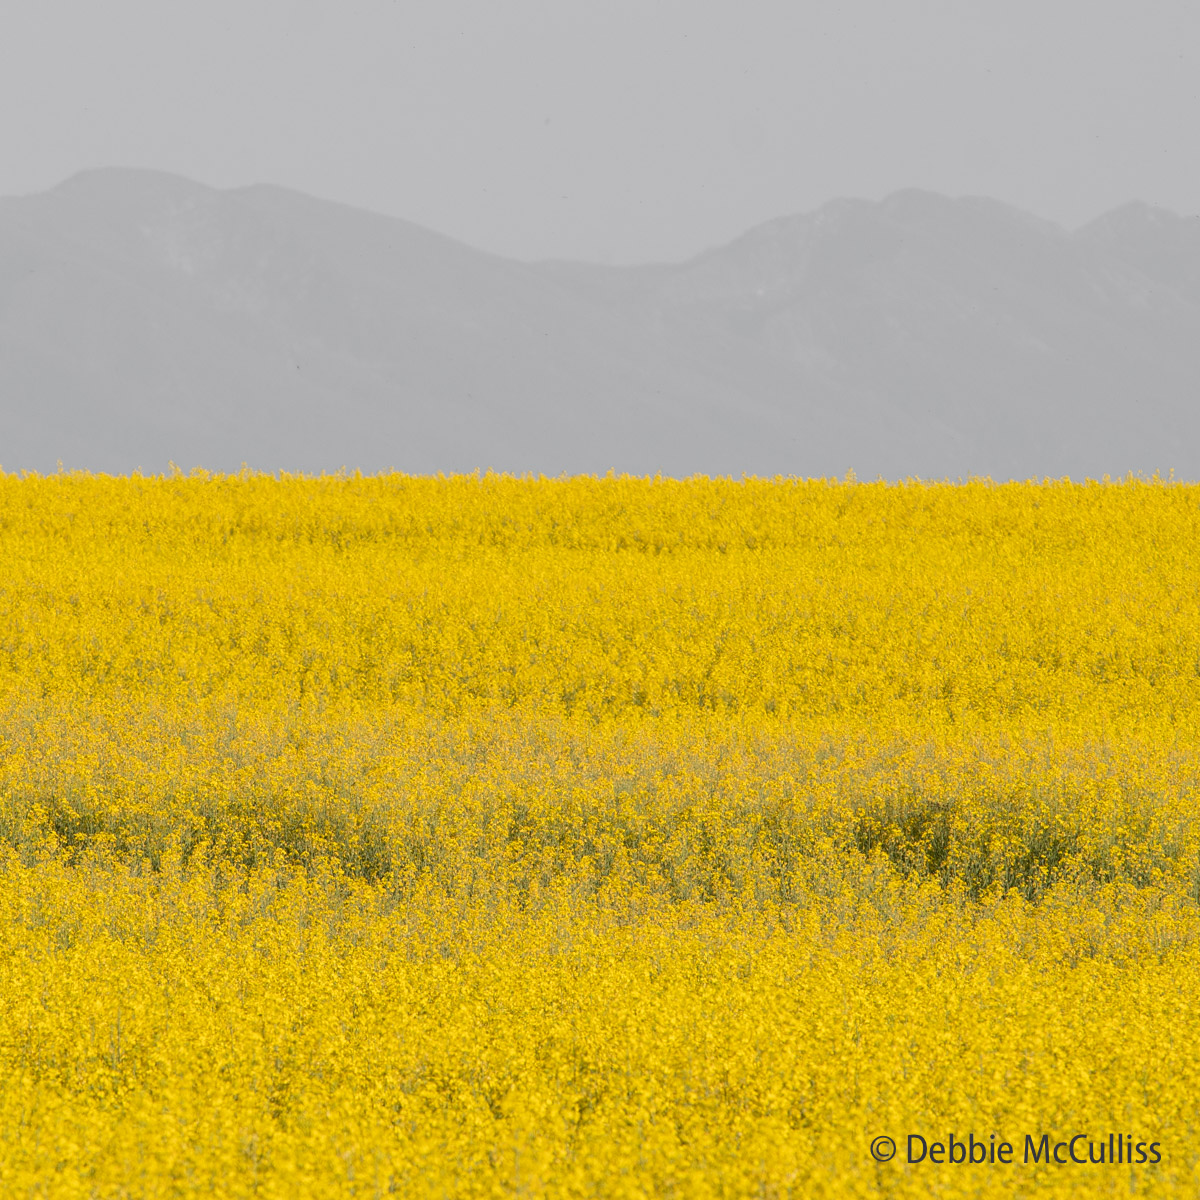 Montana Canola Field, photo